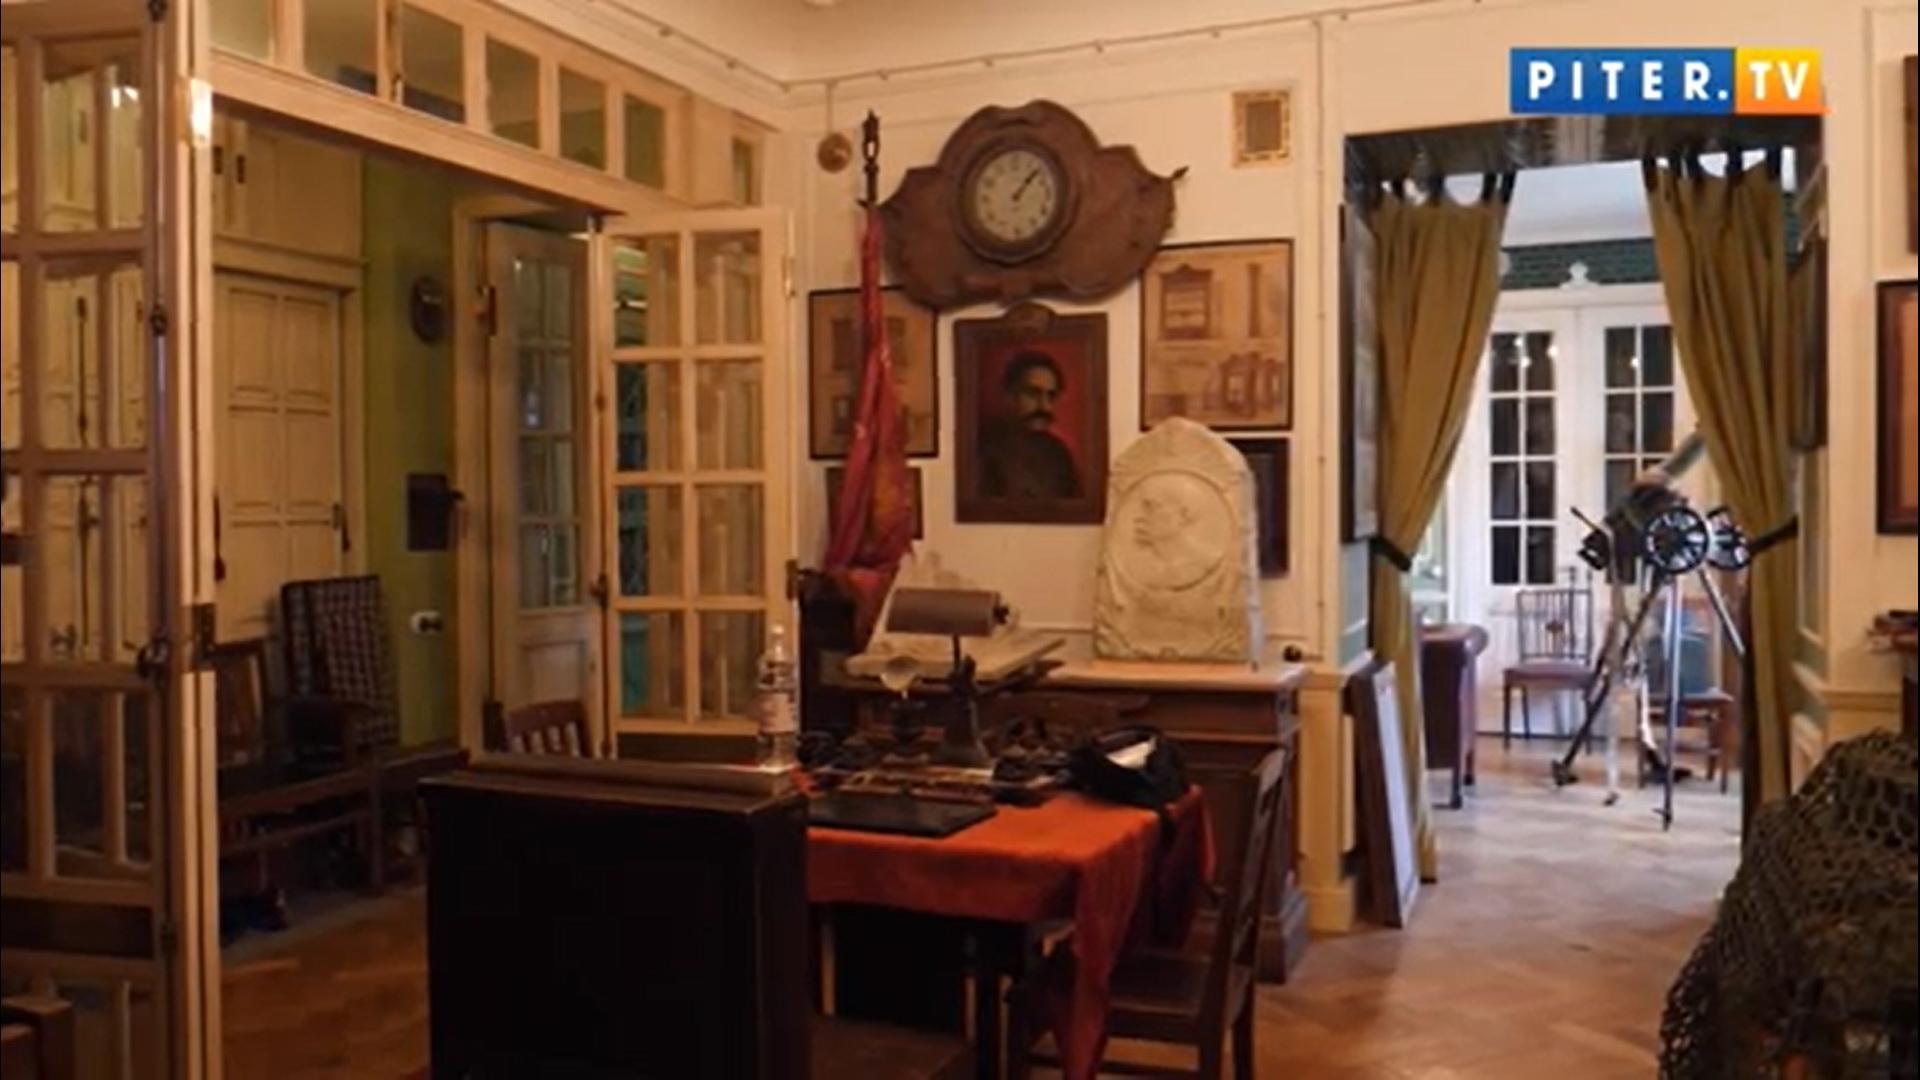 The Private Museum of Soviet Propaganda in St. Petersburg